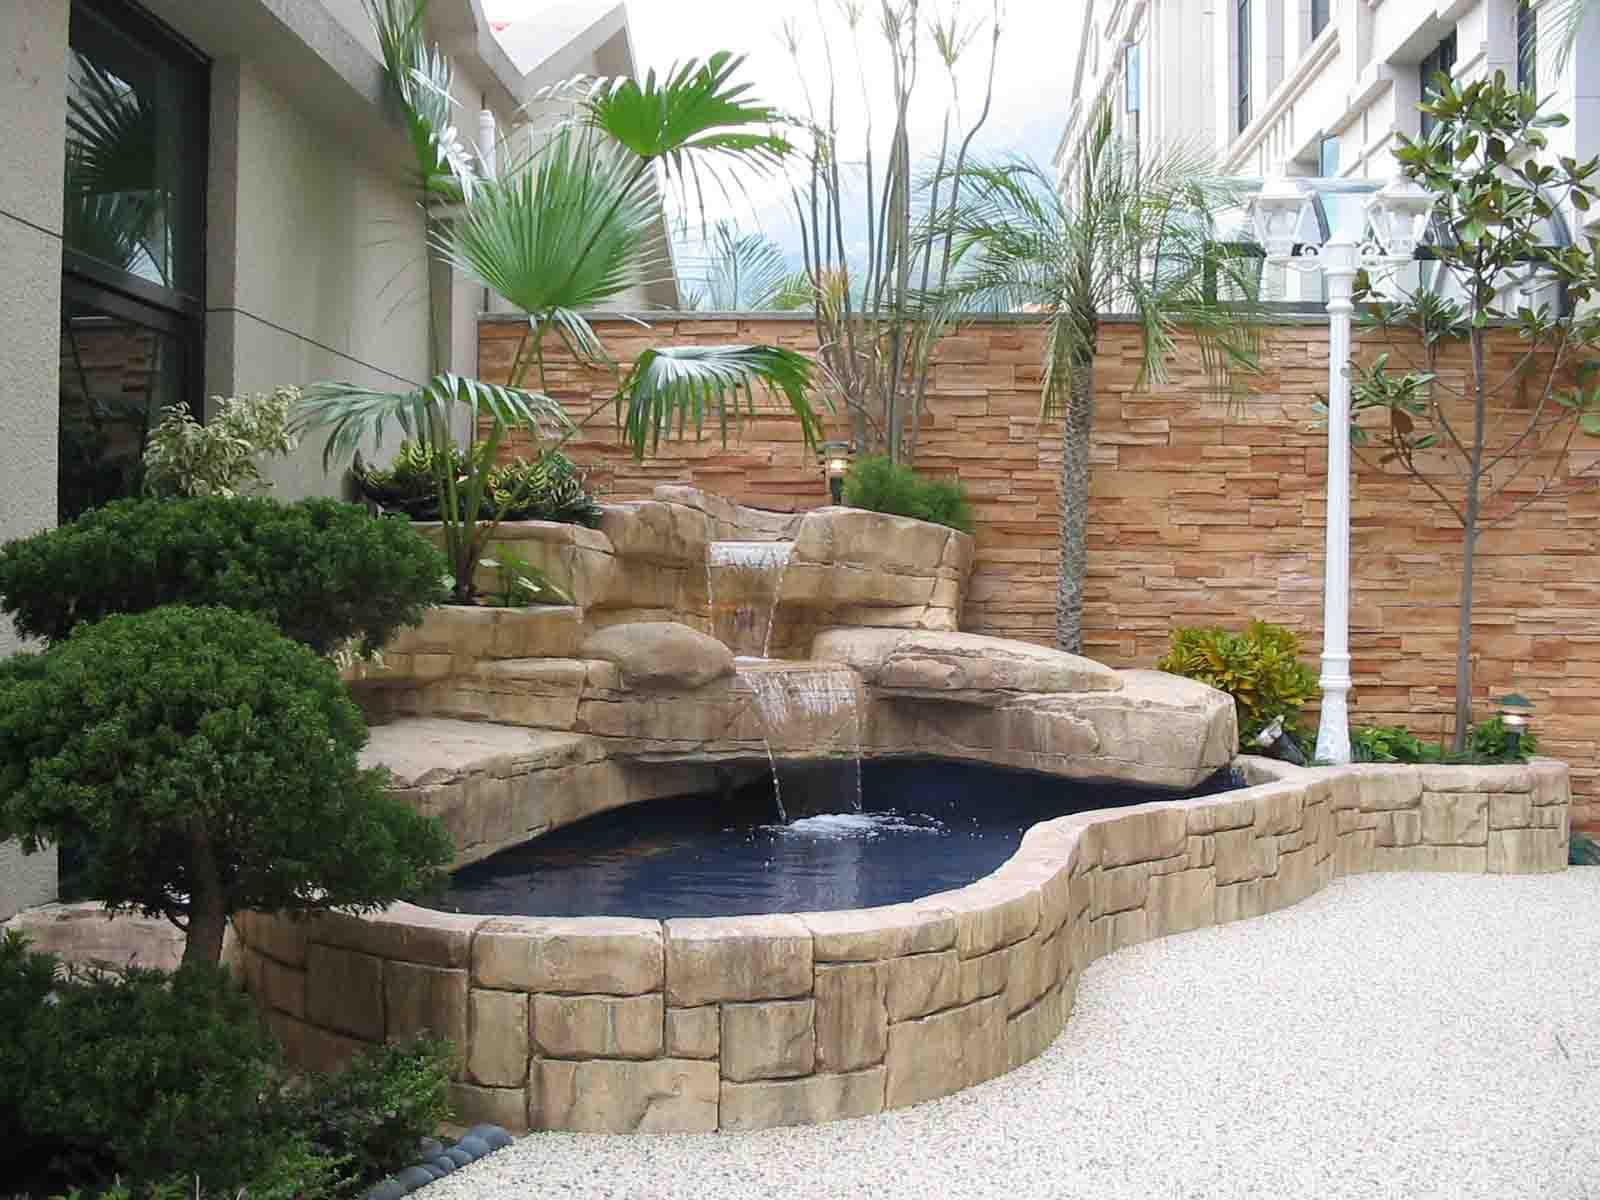 Fish Pond Garden Design | Backyard Design Ideas on Backyard Koi Pond Designs  id=43140